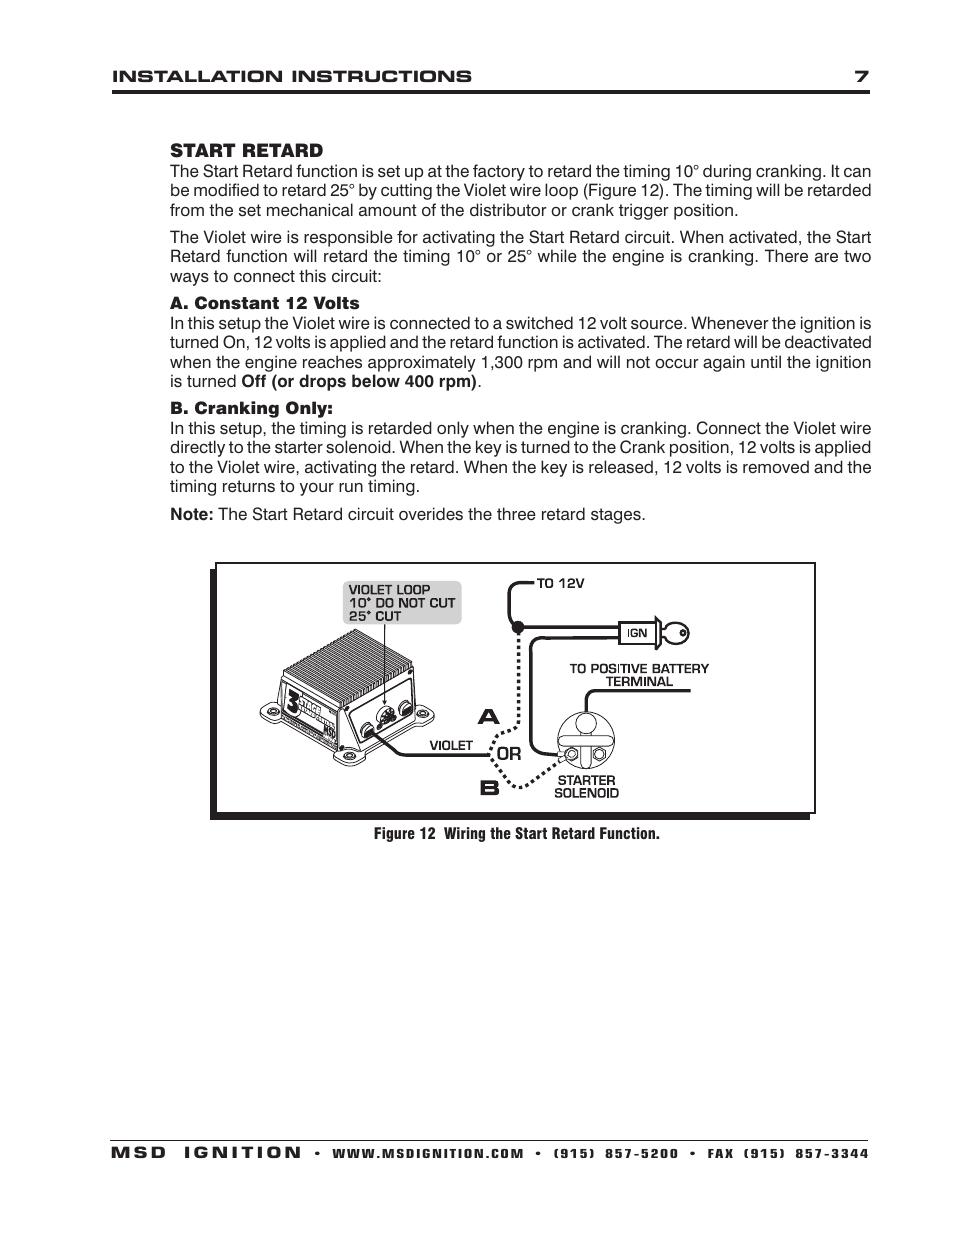 medium resolution of msd 8970 three stage retard control installation user manual page 7 8